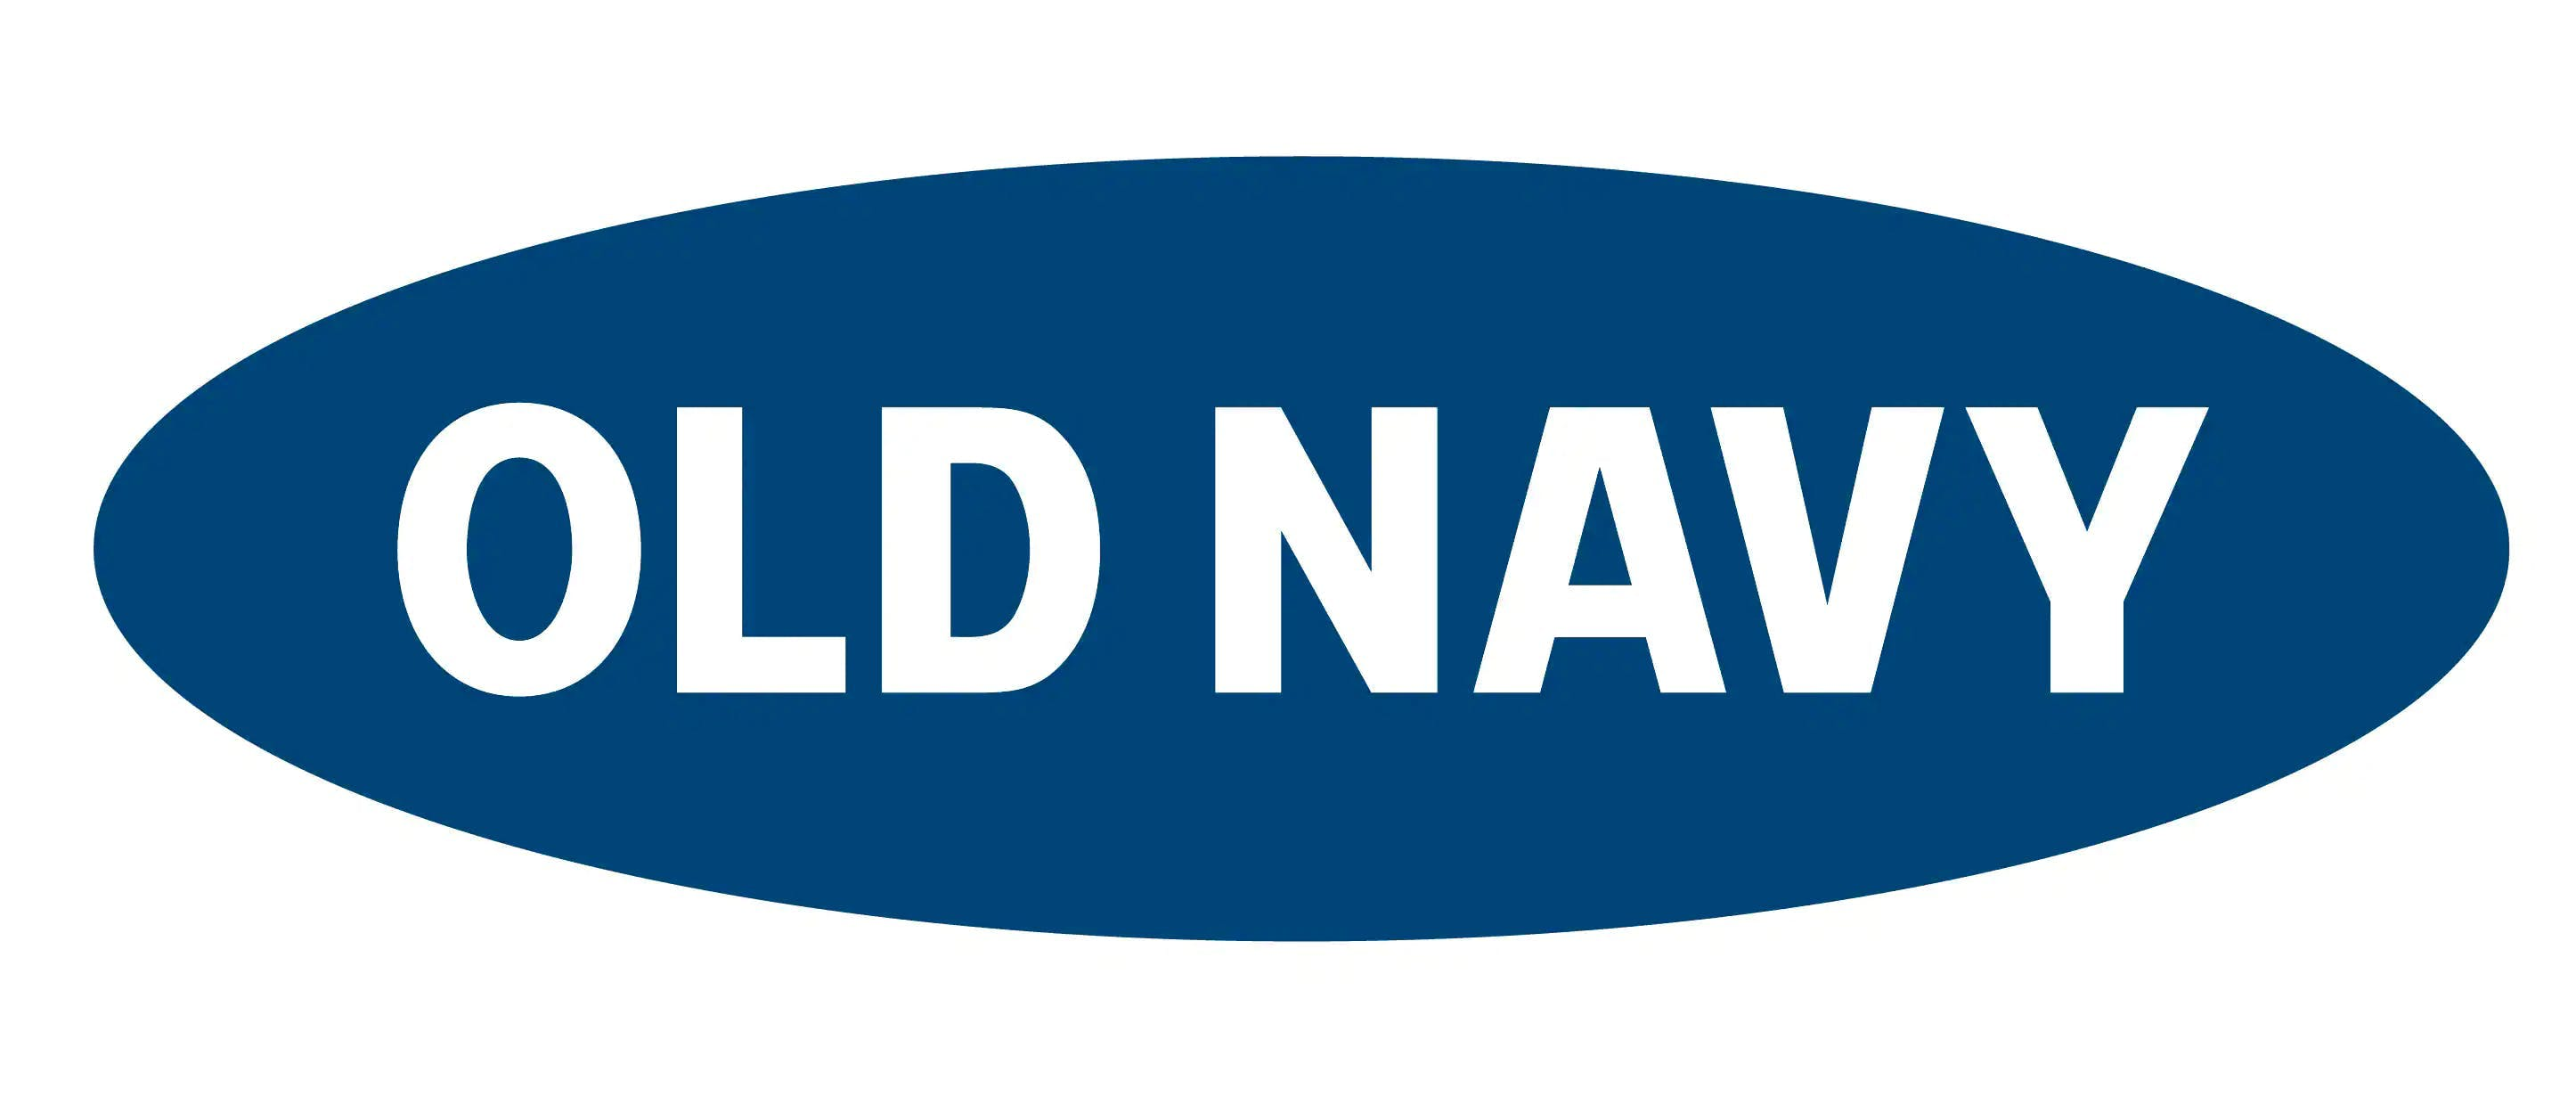 old navy logo2